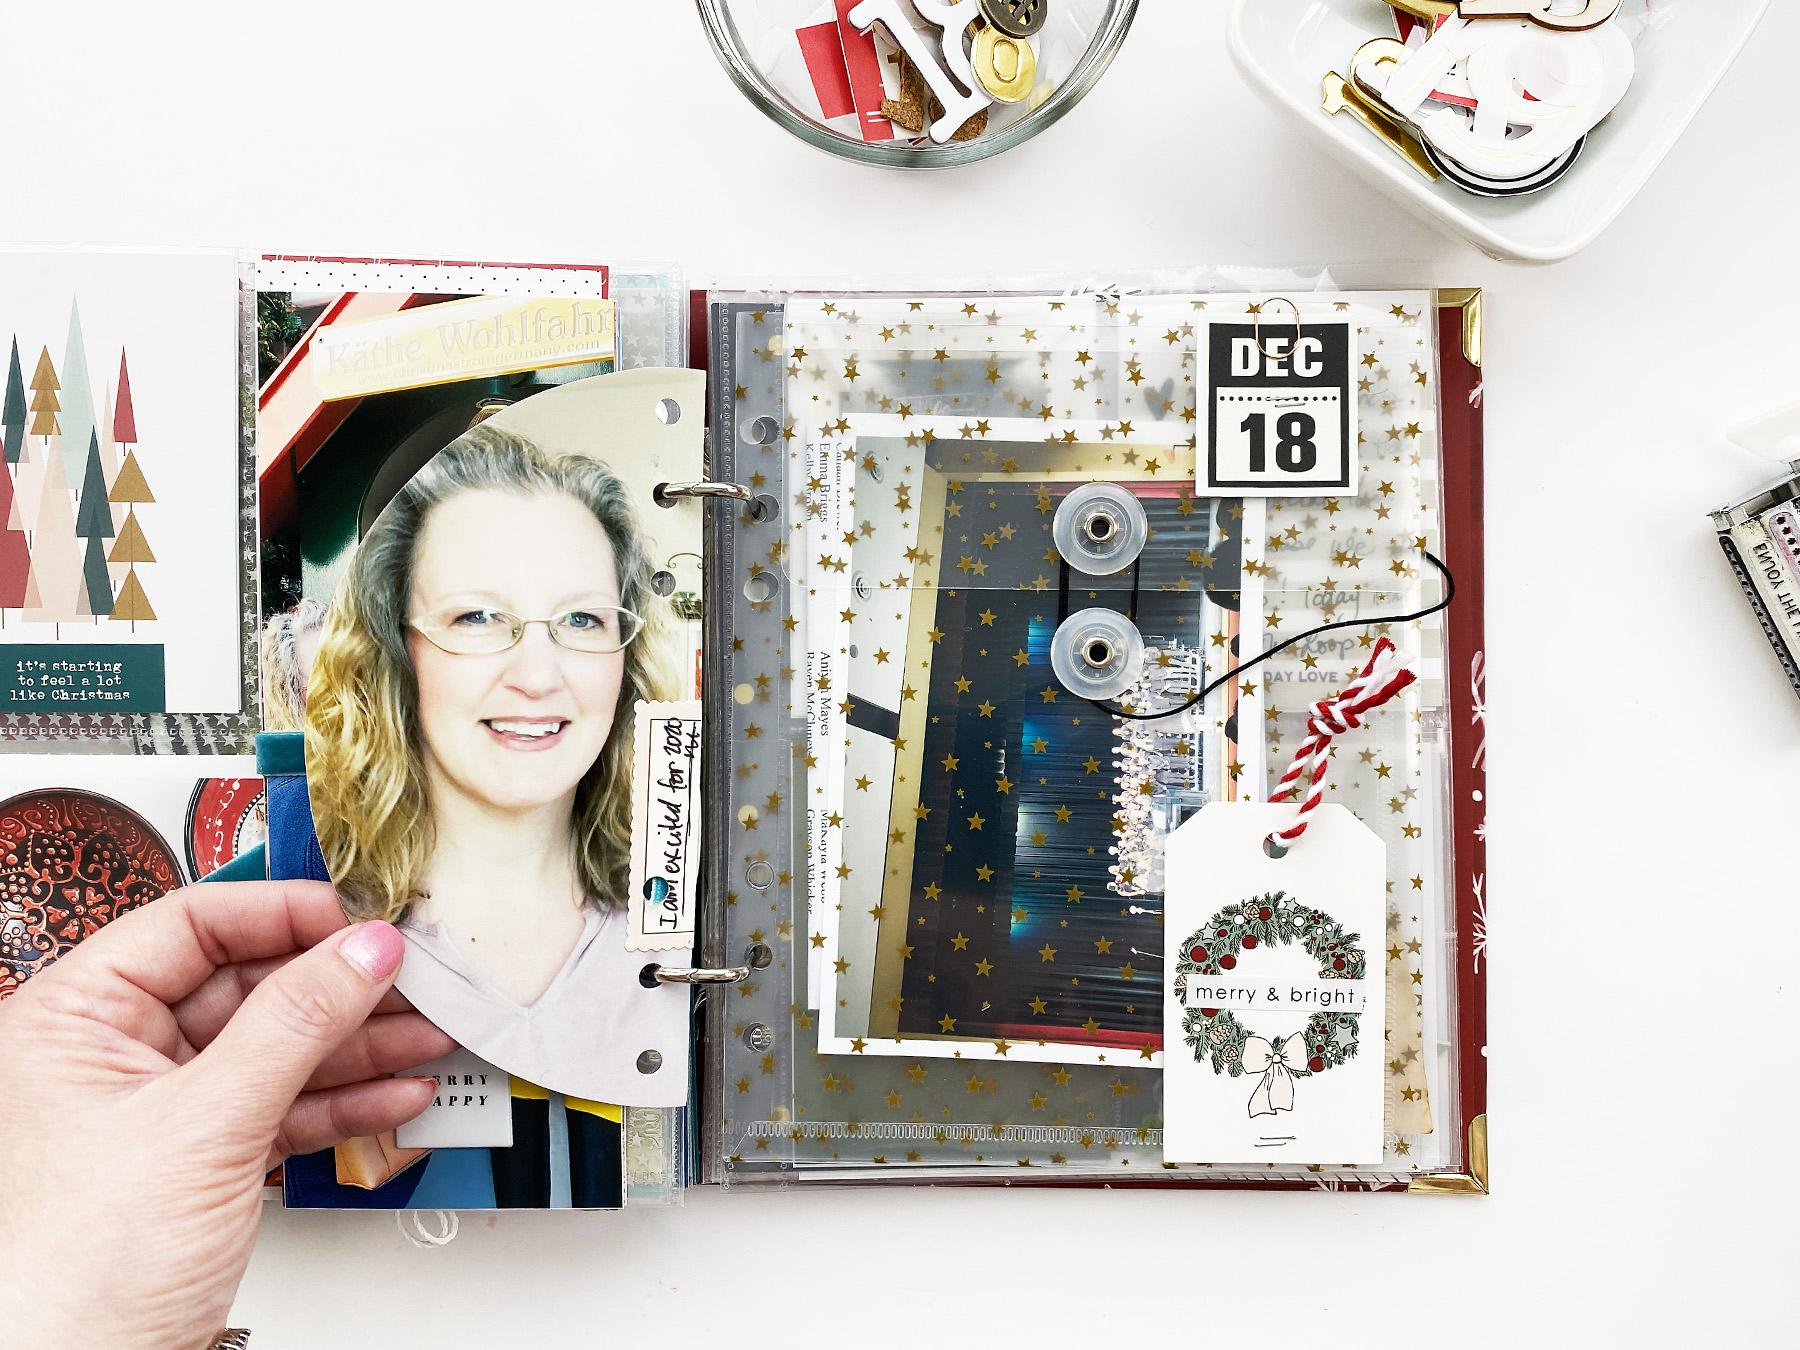 Larkindesign December Daily 2019 Days 17 Thru 20 Ft. Felicity Jane & Ali Edwards